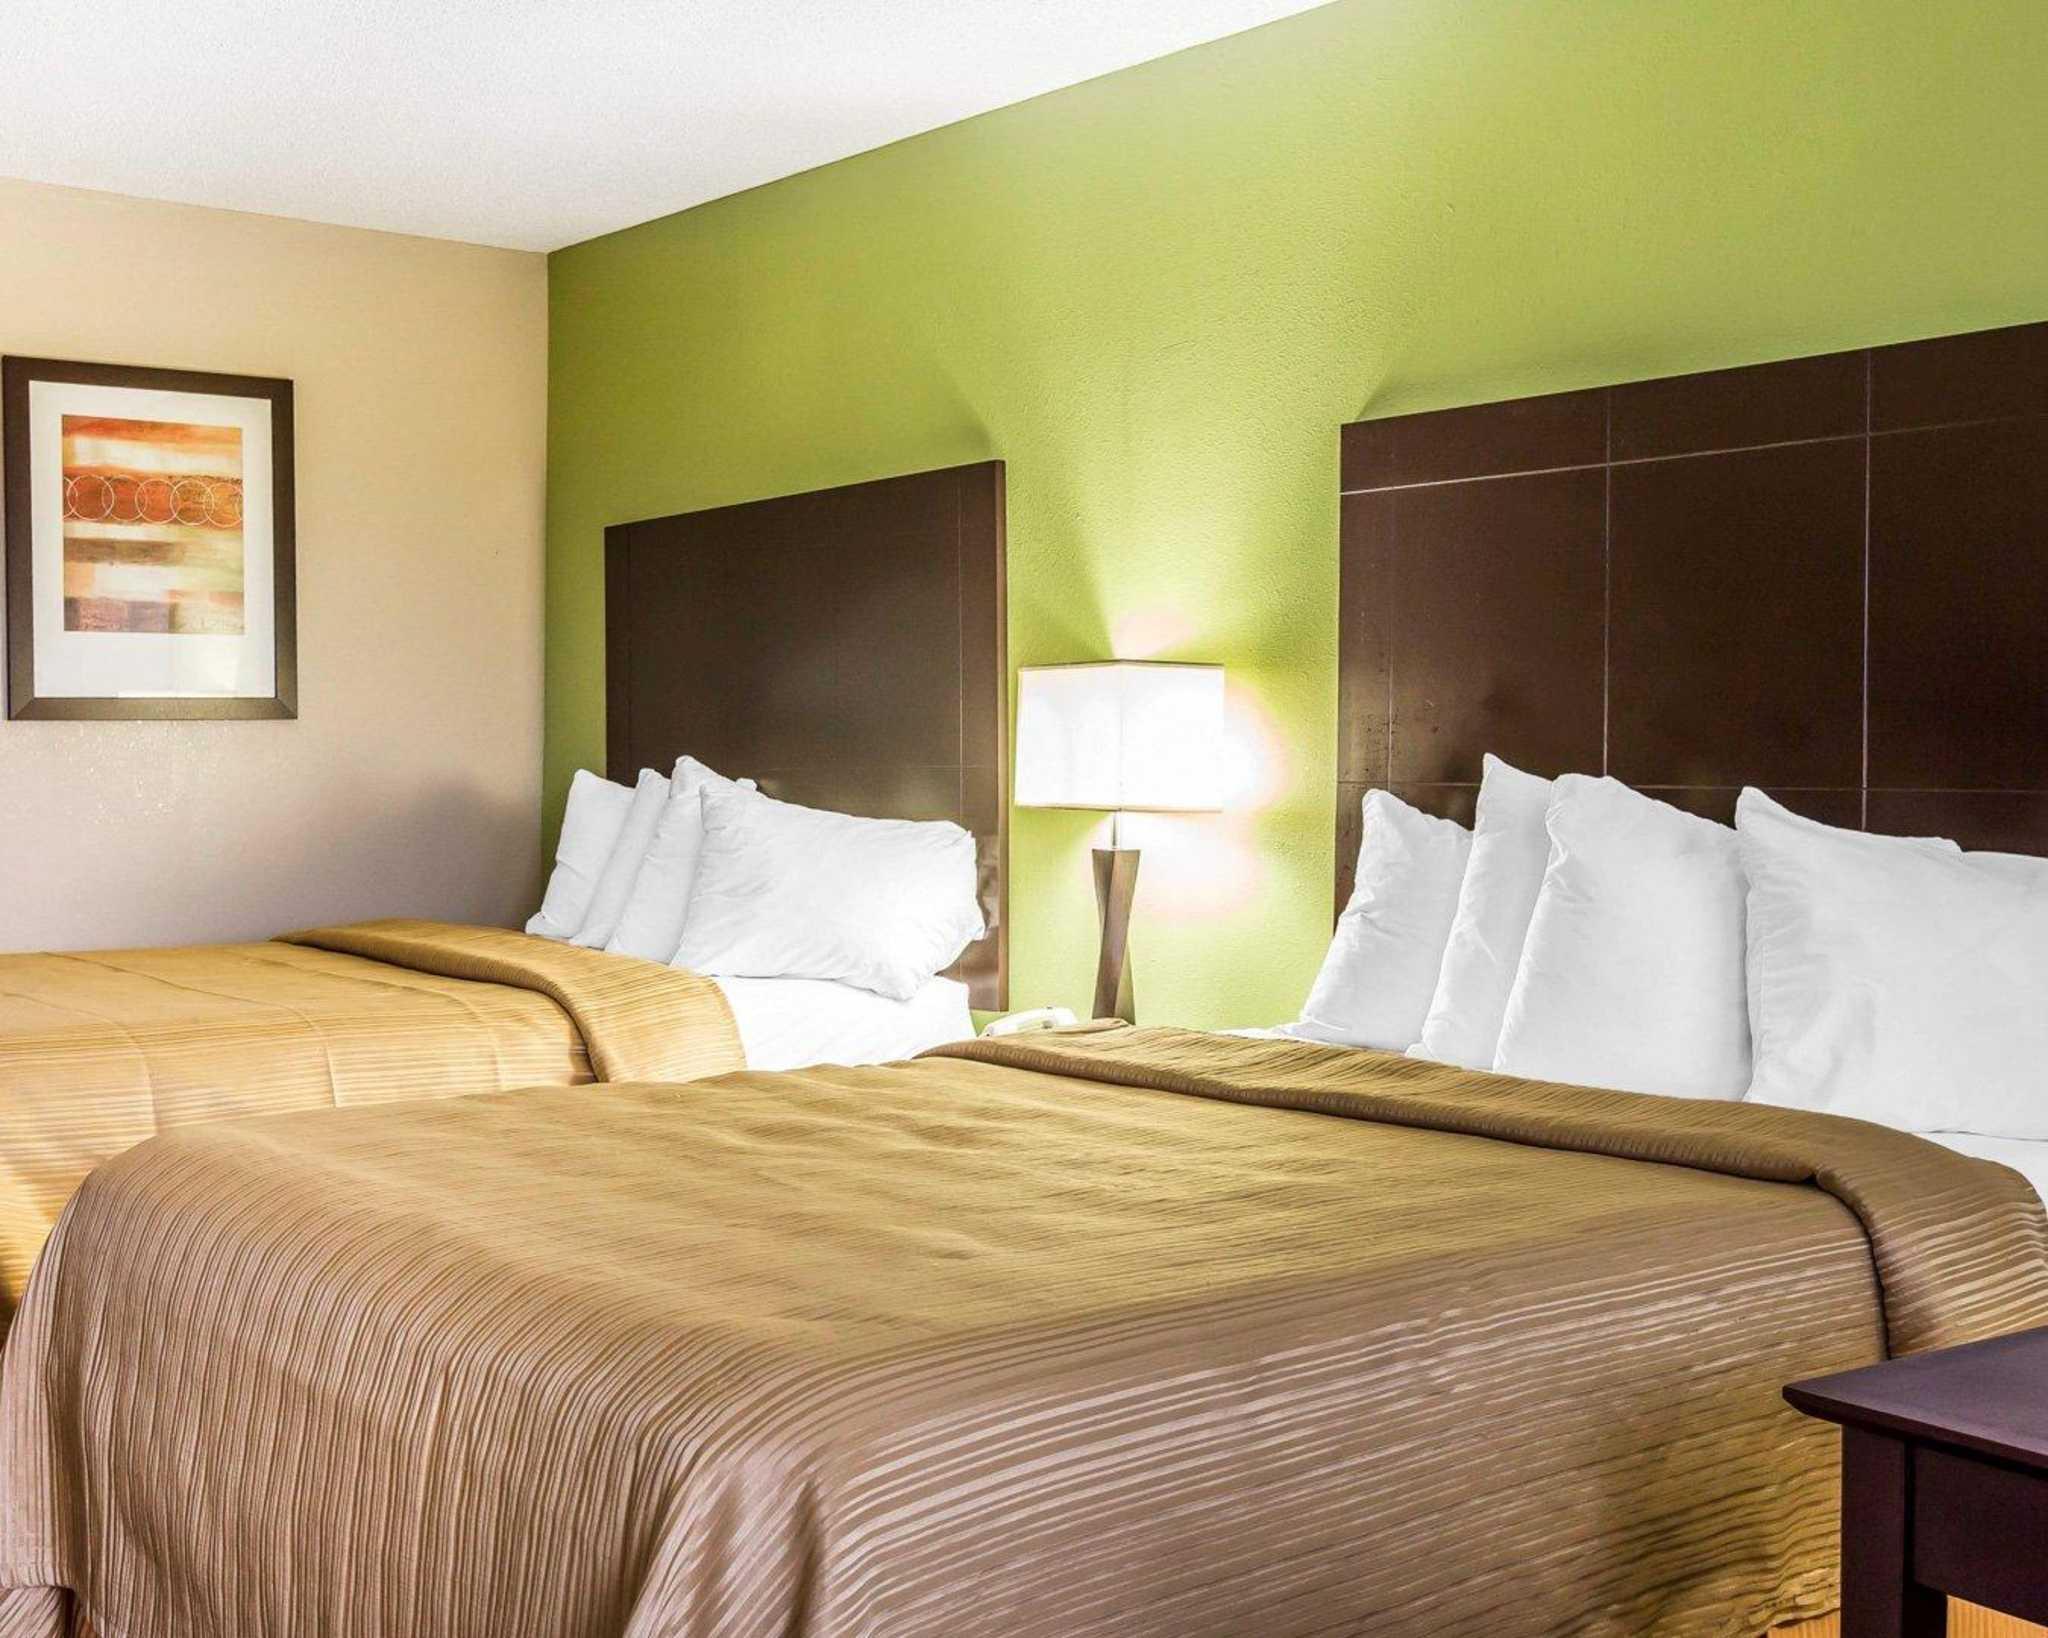 Quality Inn & Suites Dublin image 10